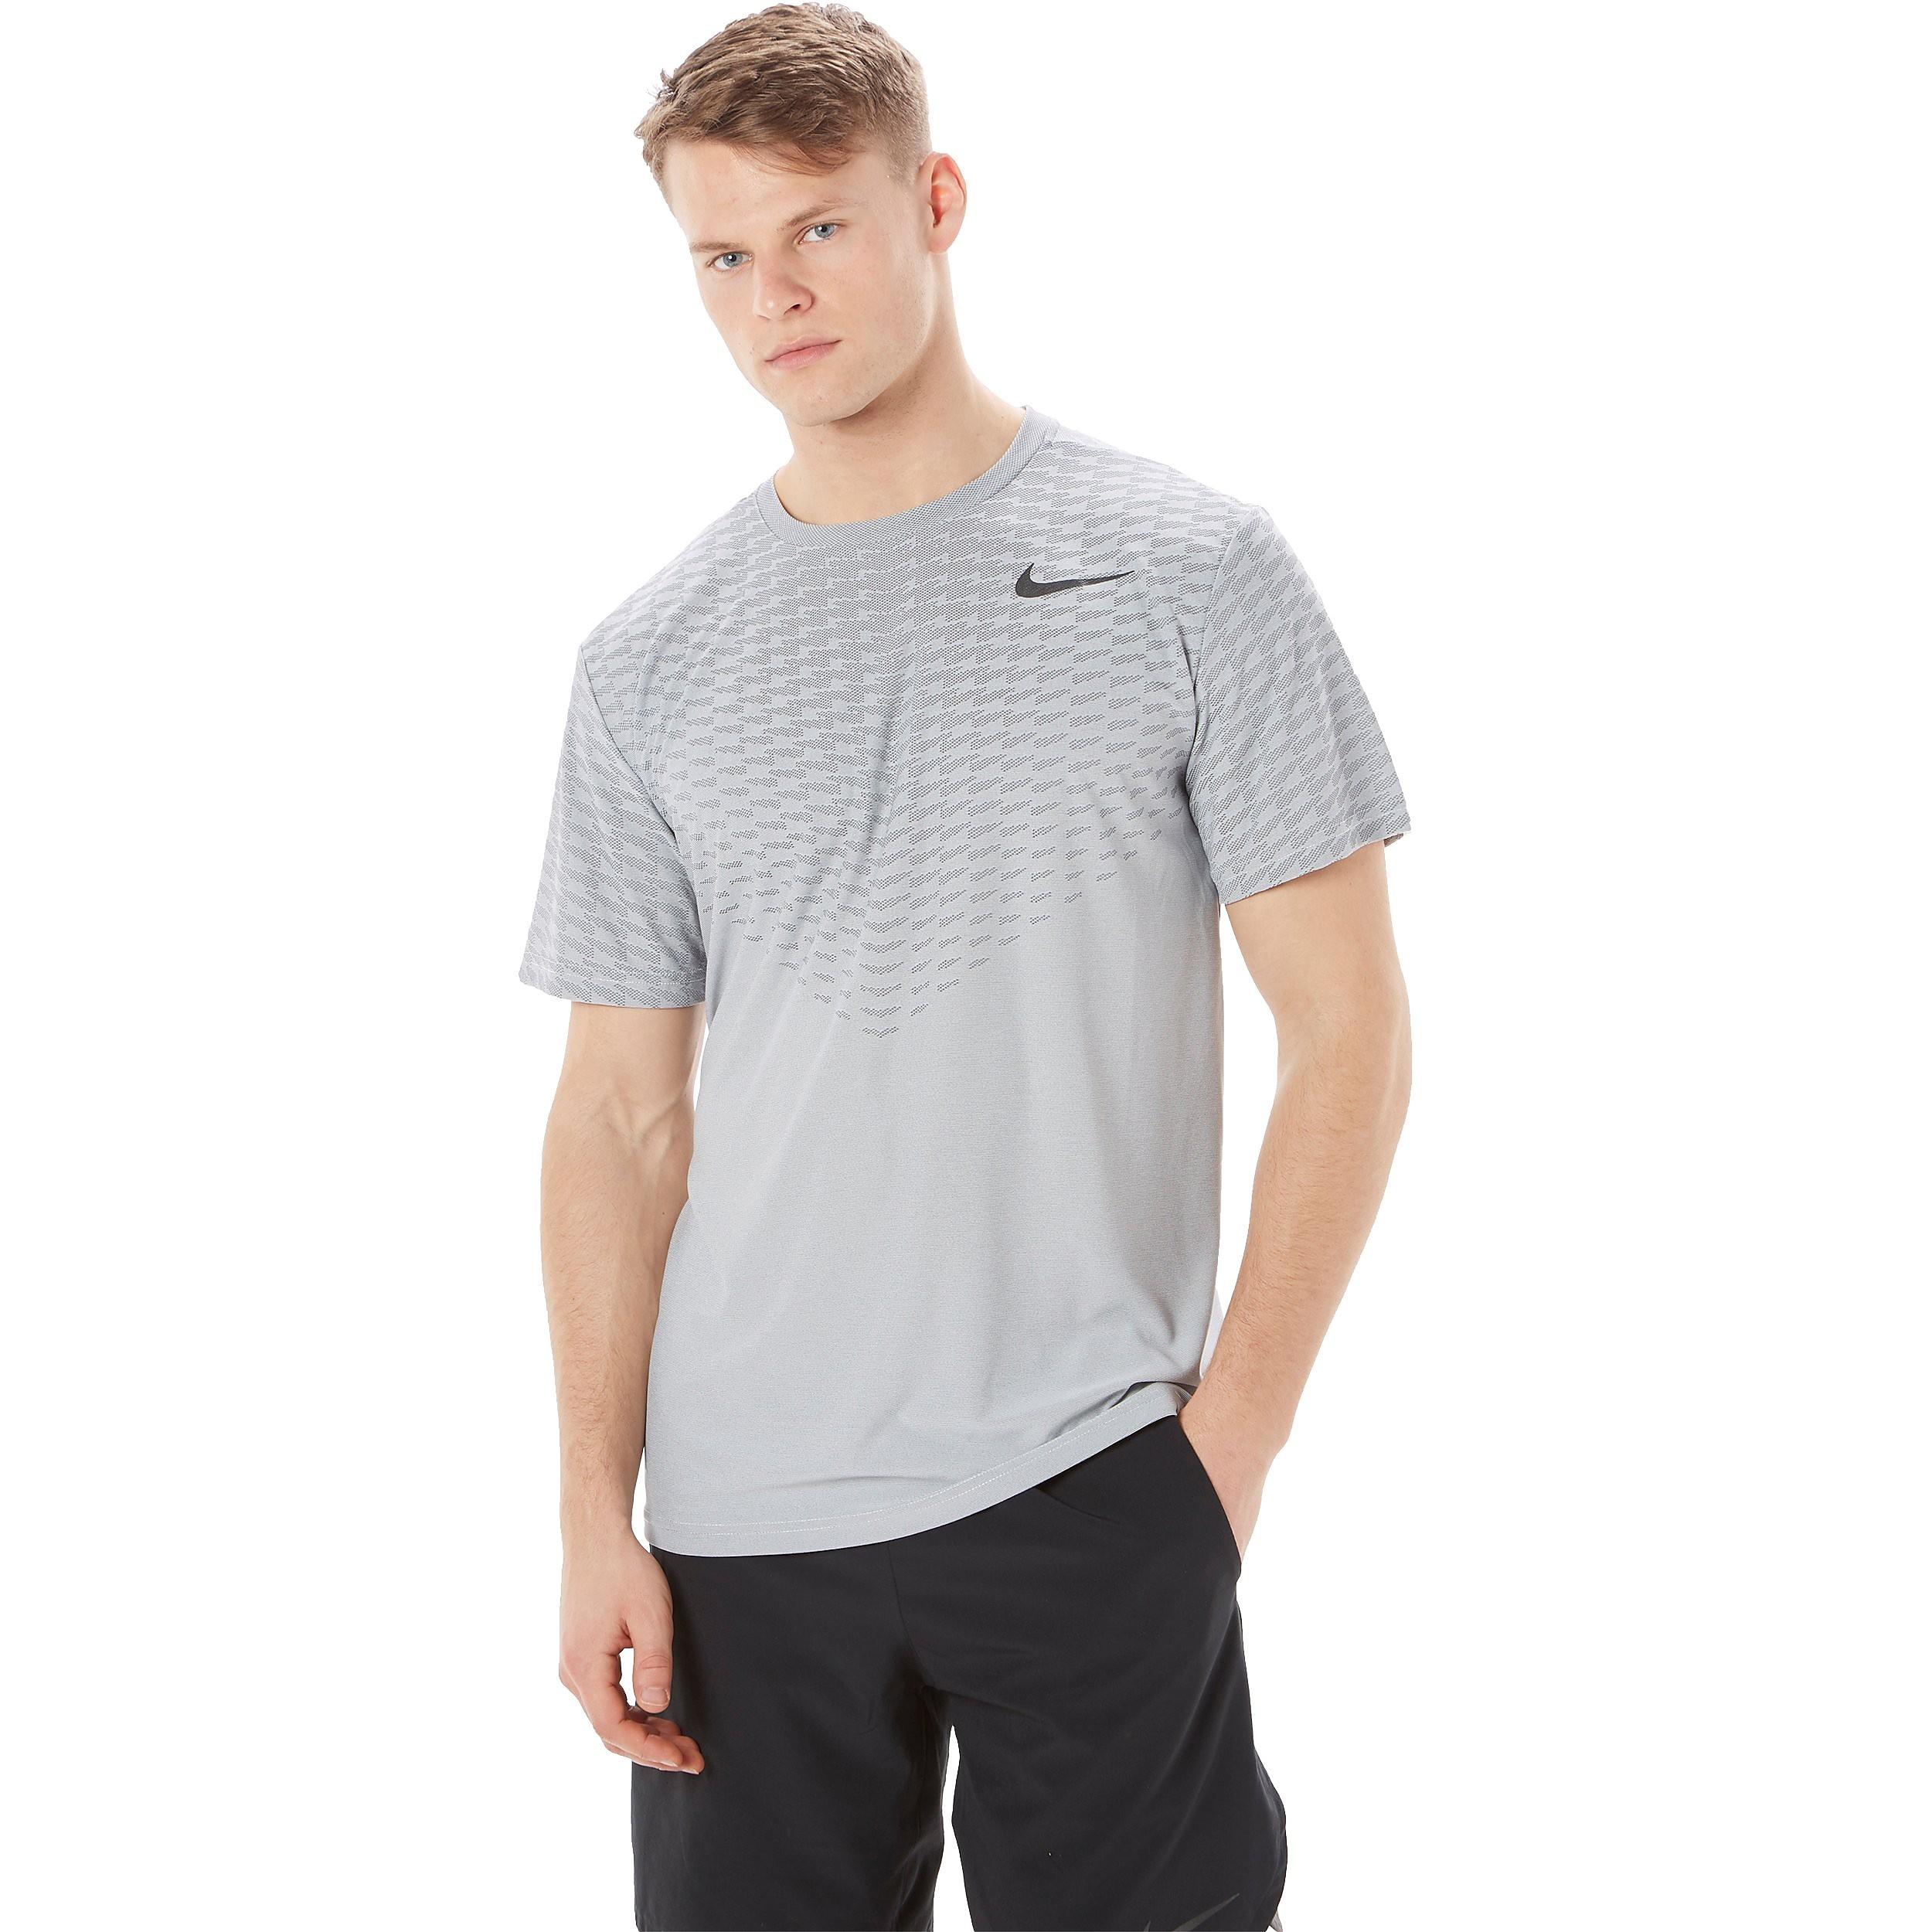 Nike Zonal Cooling Relay Men's Running T-Shirt